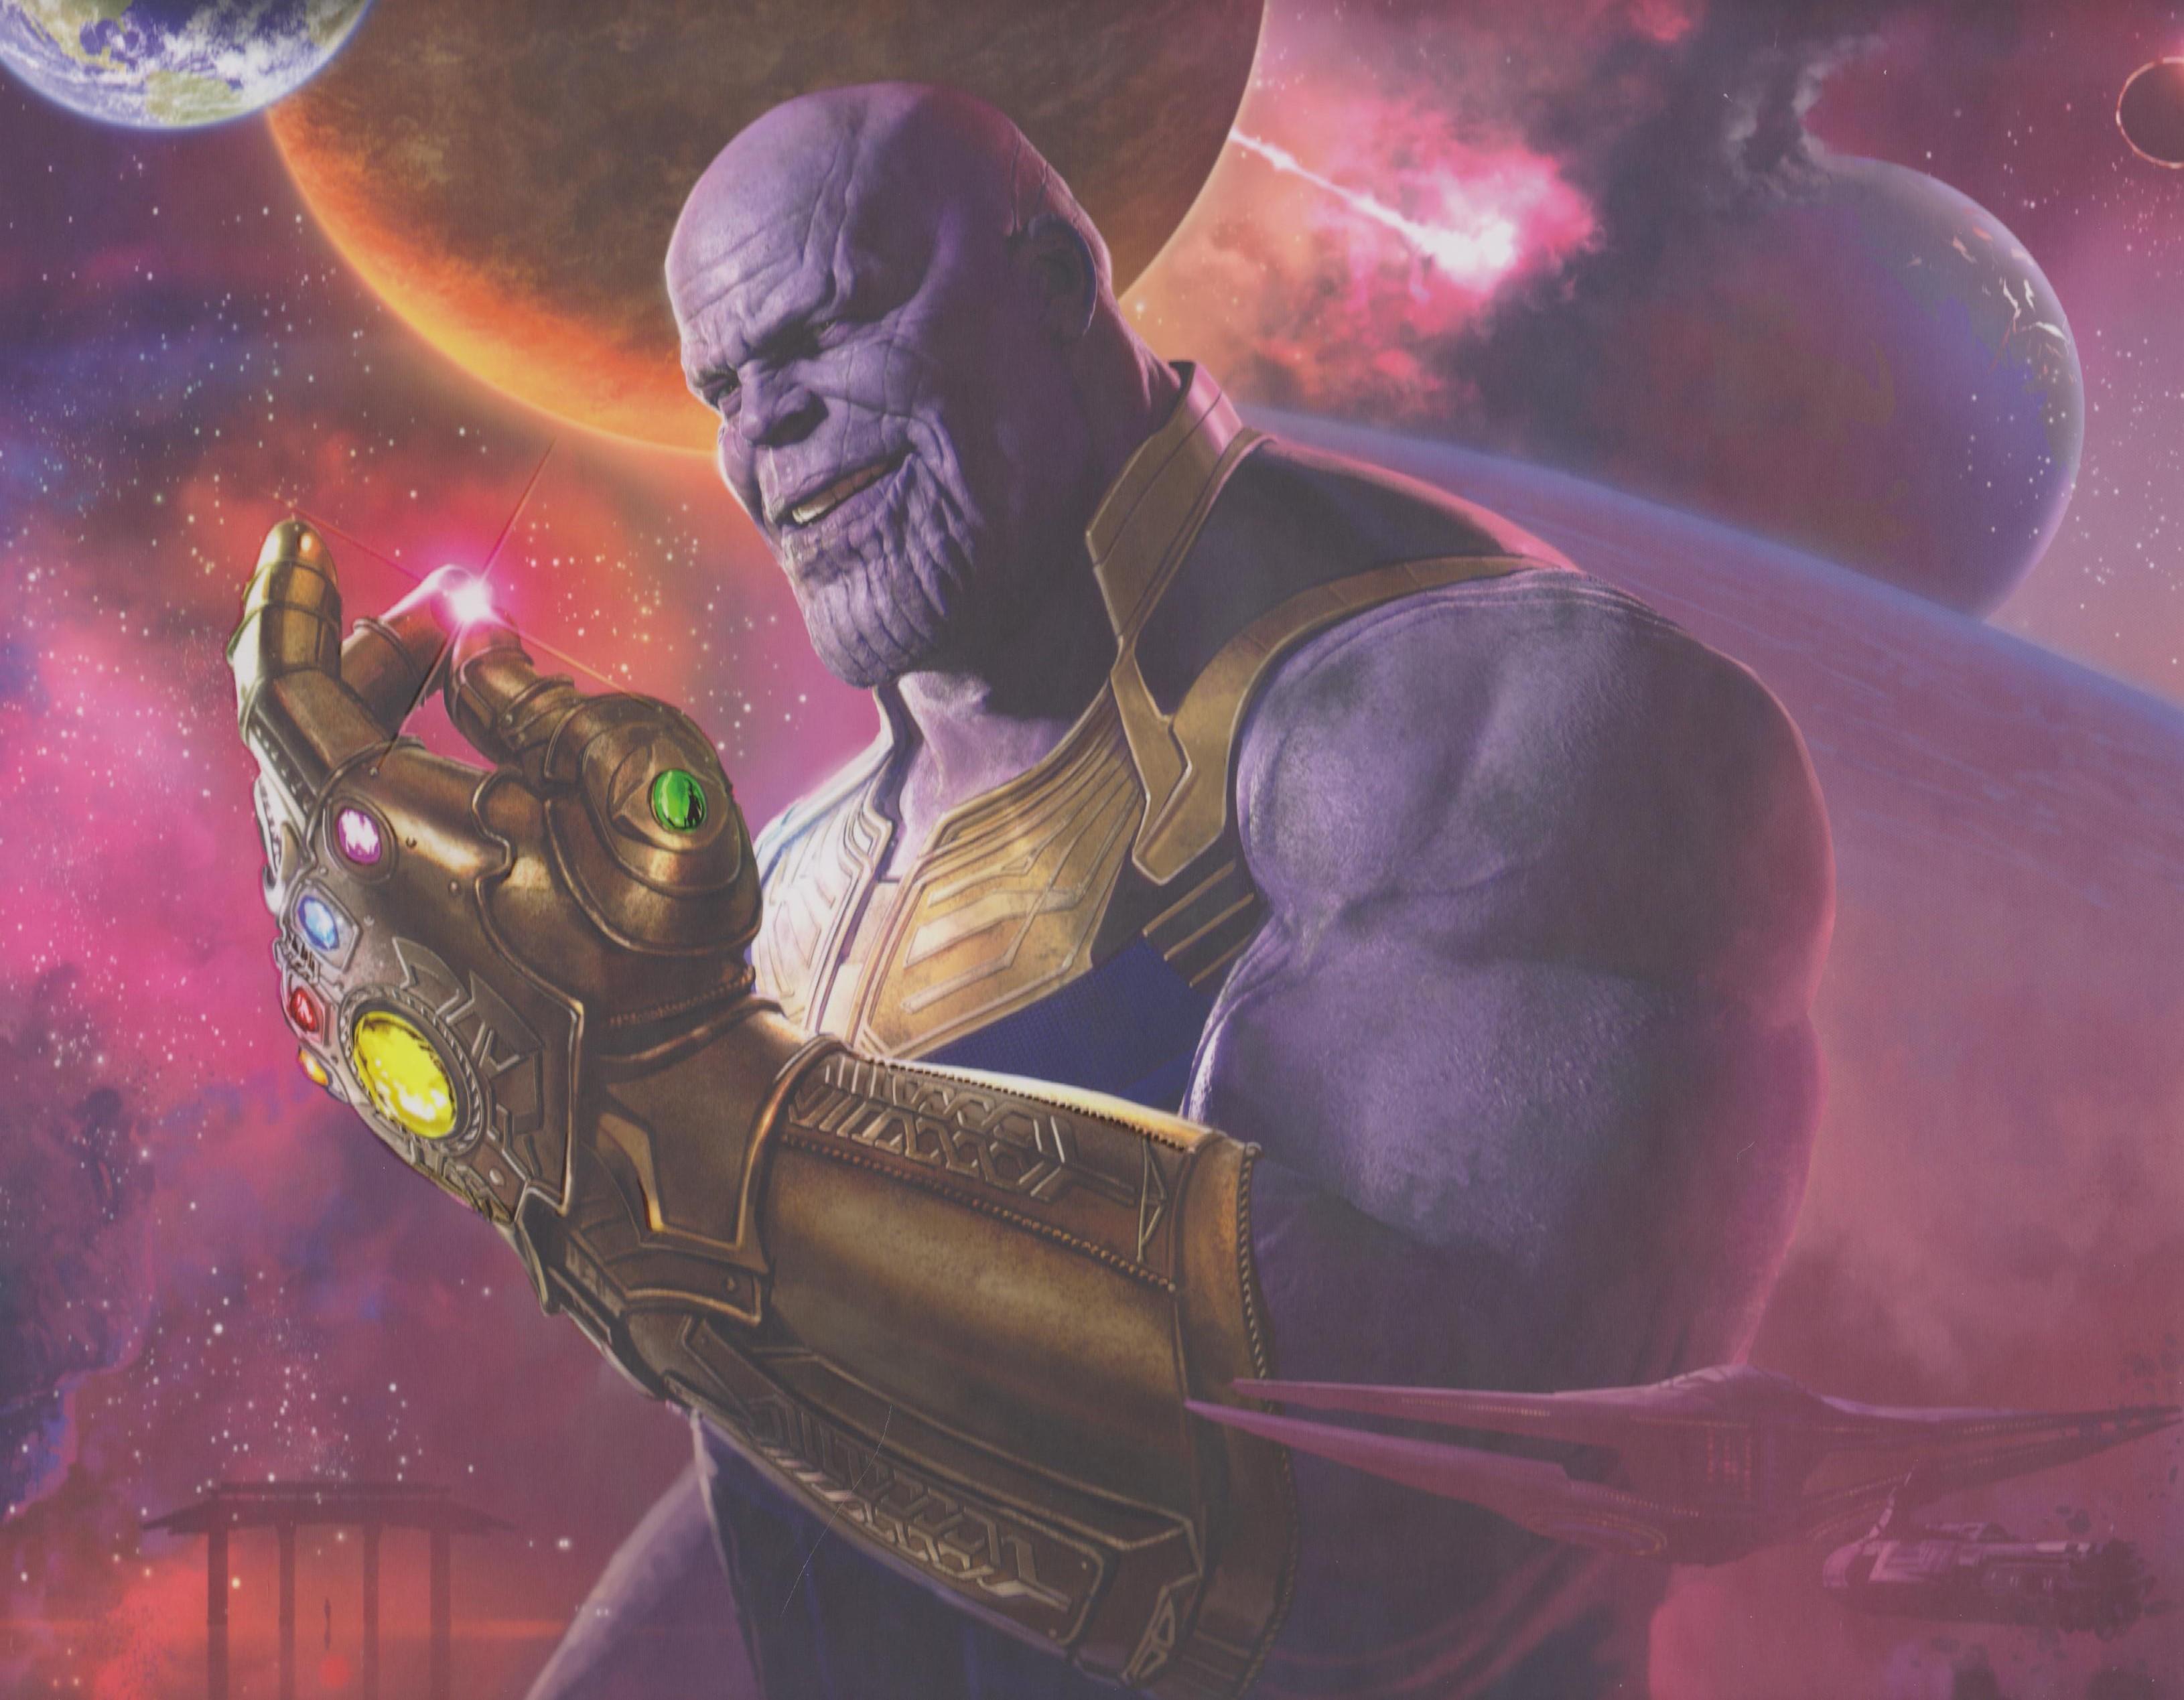 Avengers Infinity War Concept Art HD Album on